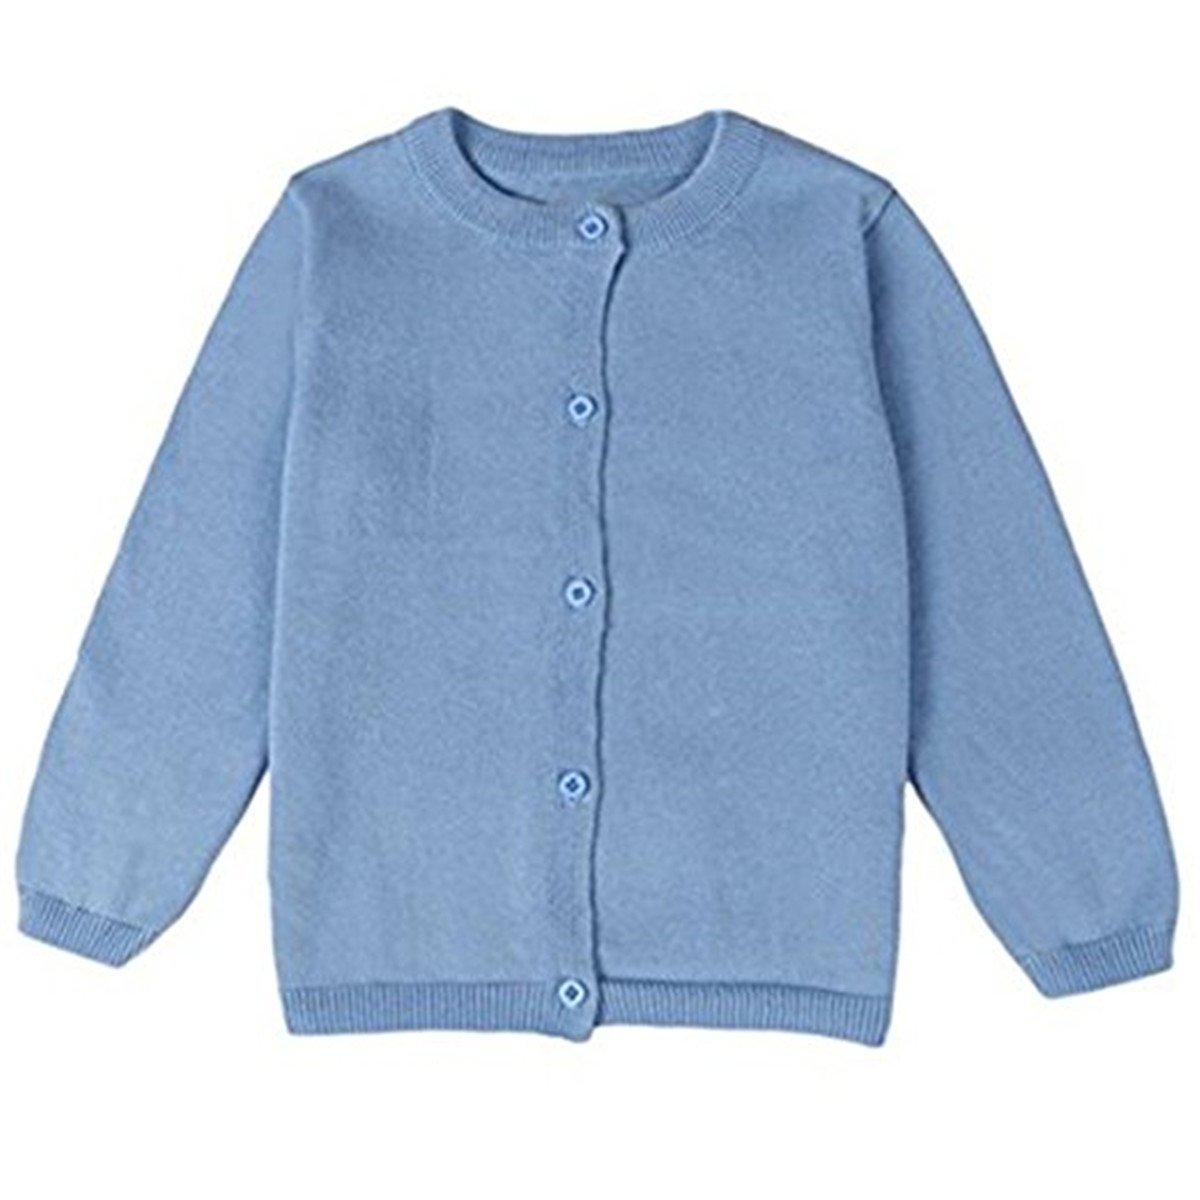 Sitmptol Girls Kids Fall Knitted Pullover Sweaters Poncho Tassel Turtleneck Cloak Cape